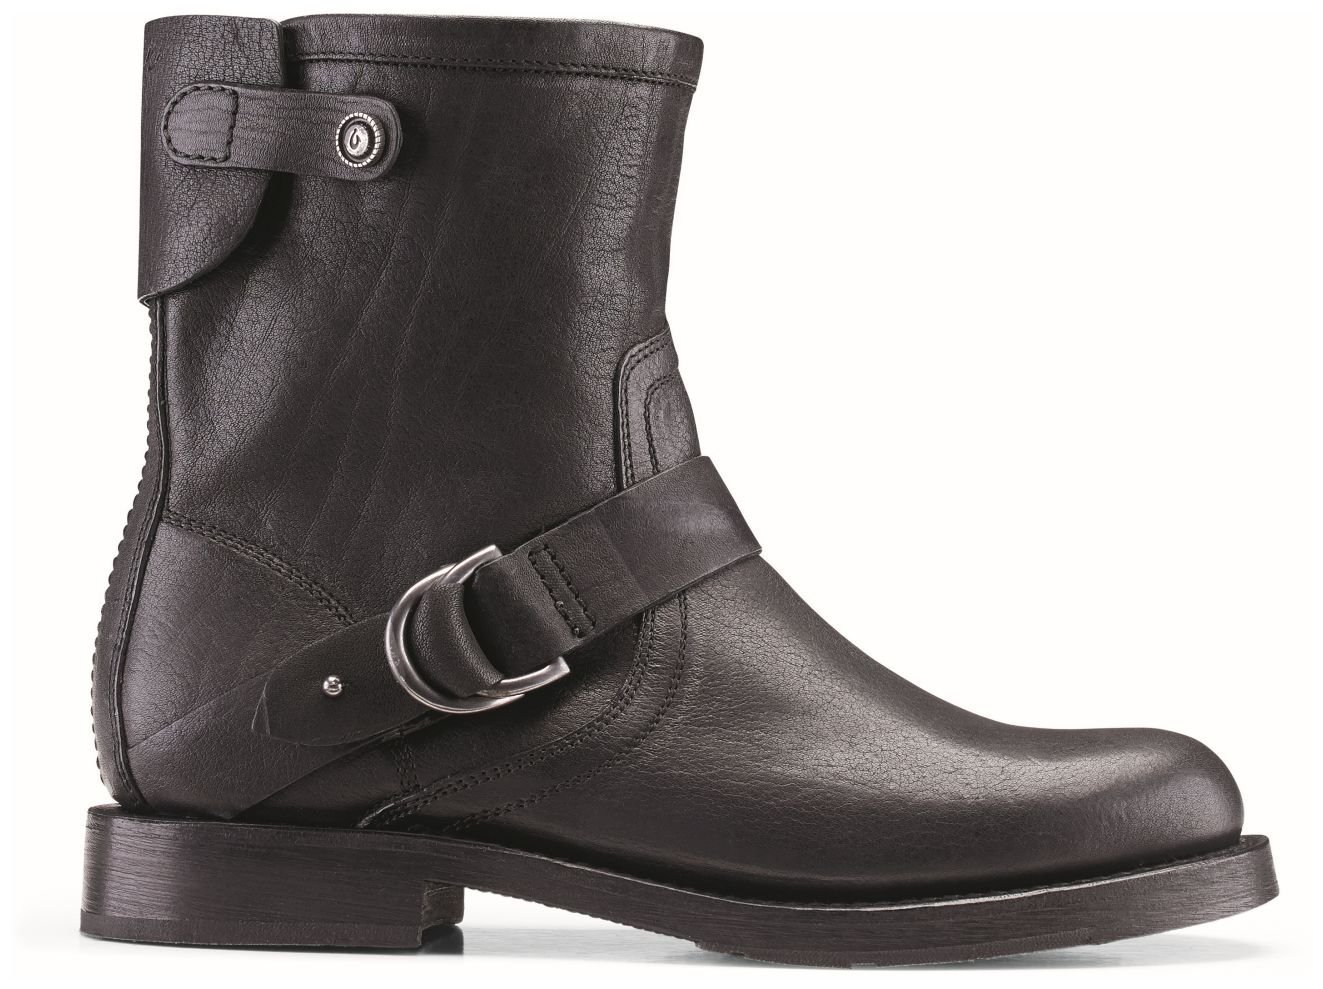 OluKai Nahuku Short Boot - Women's Black 7 by OluKai